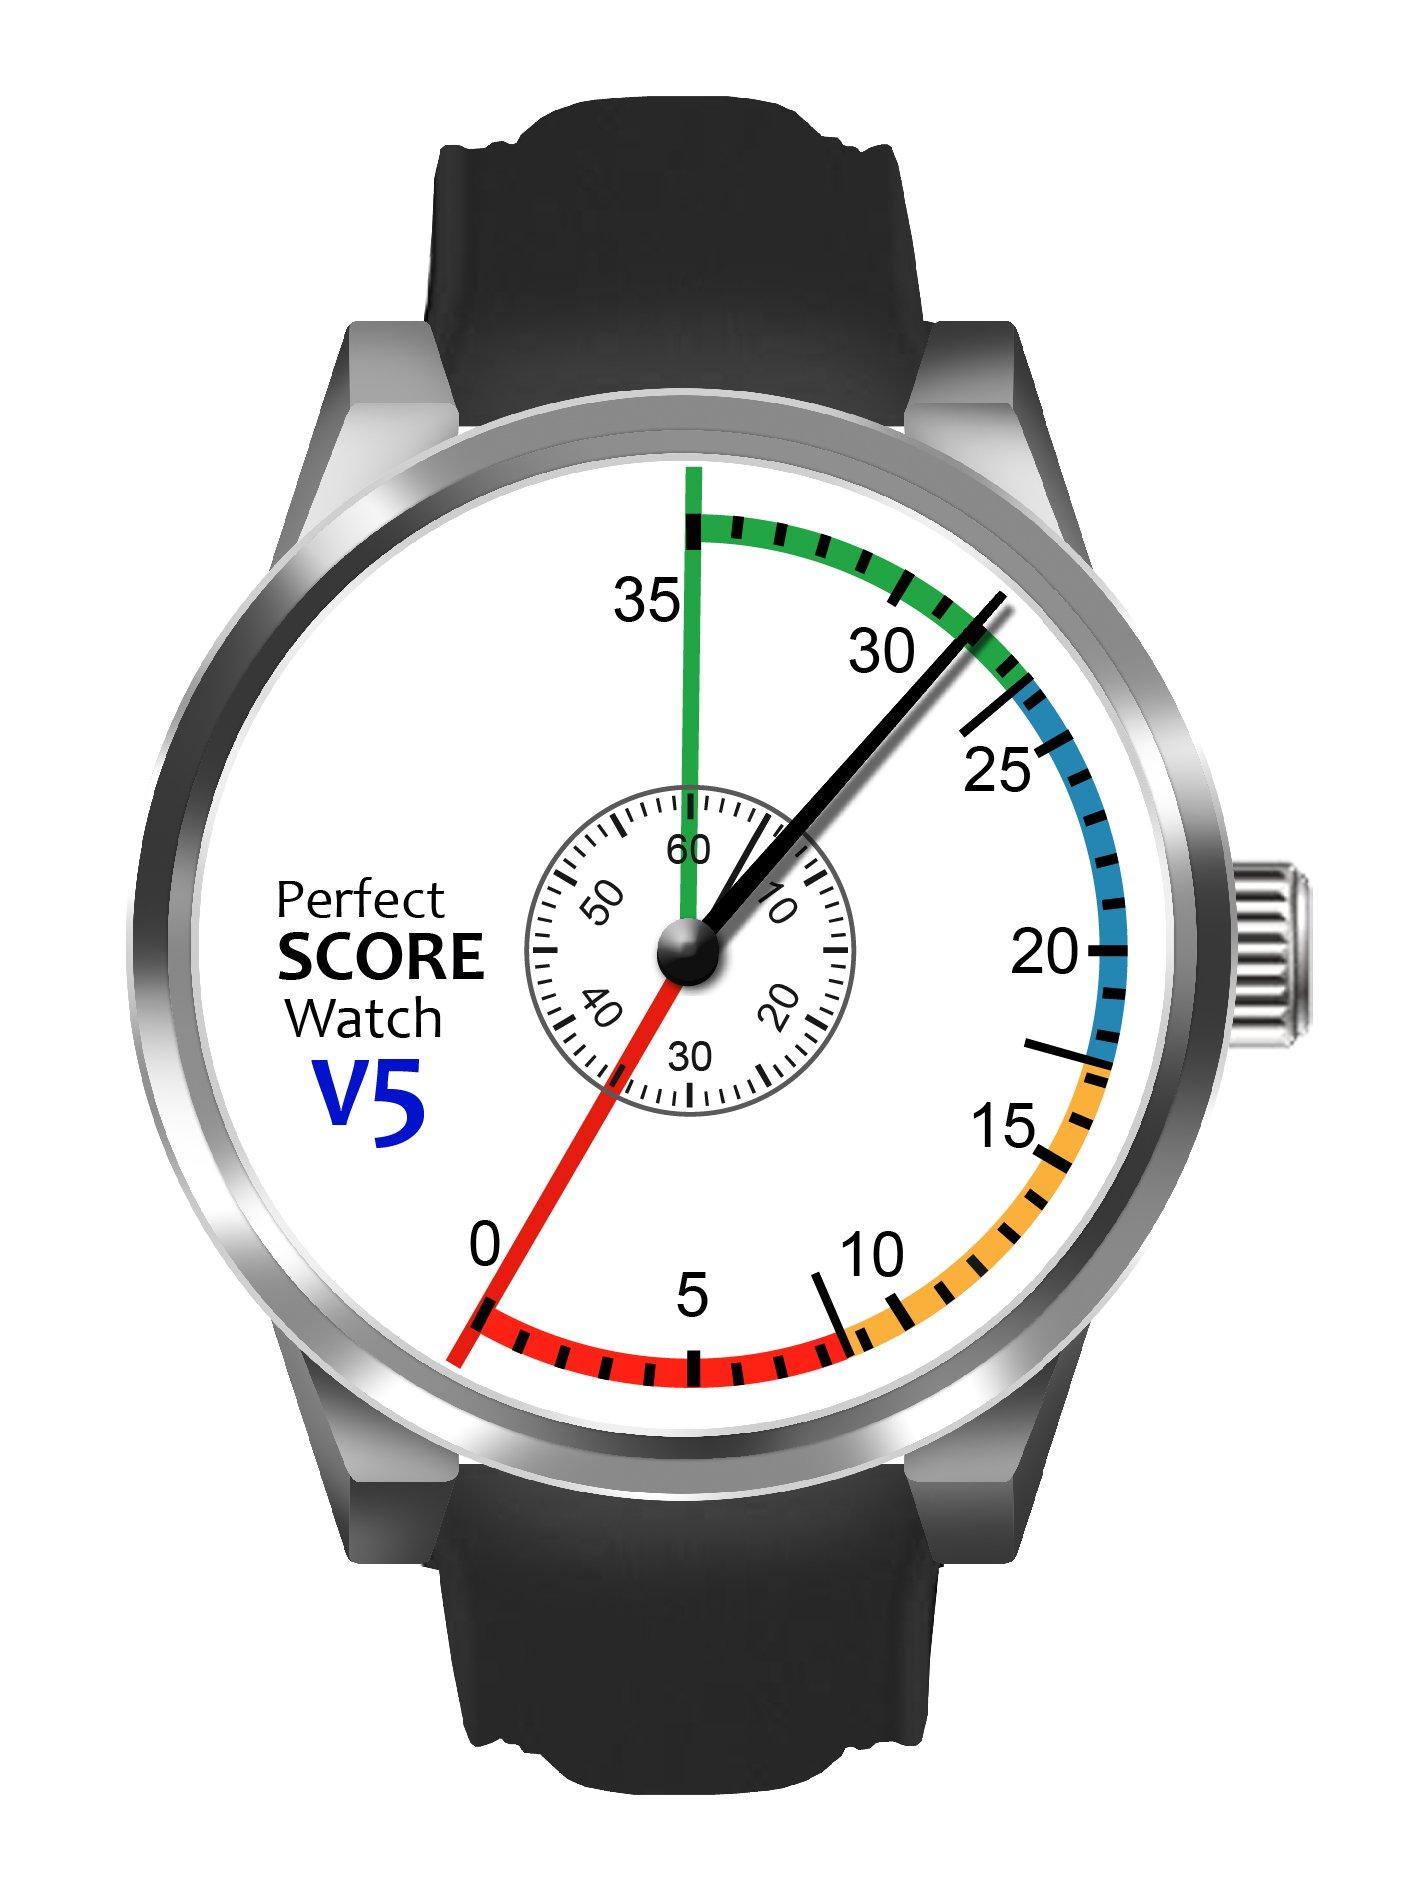 Perfect Score Watch Version 5 for LSAT Exam Prep